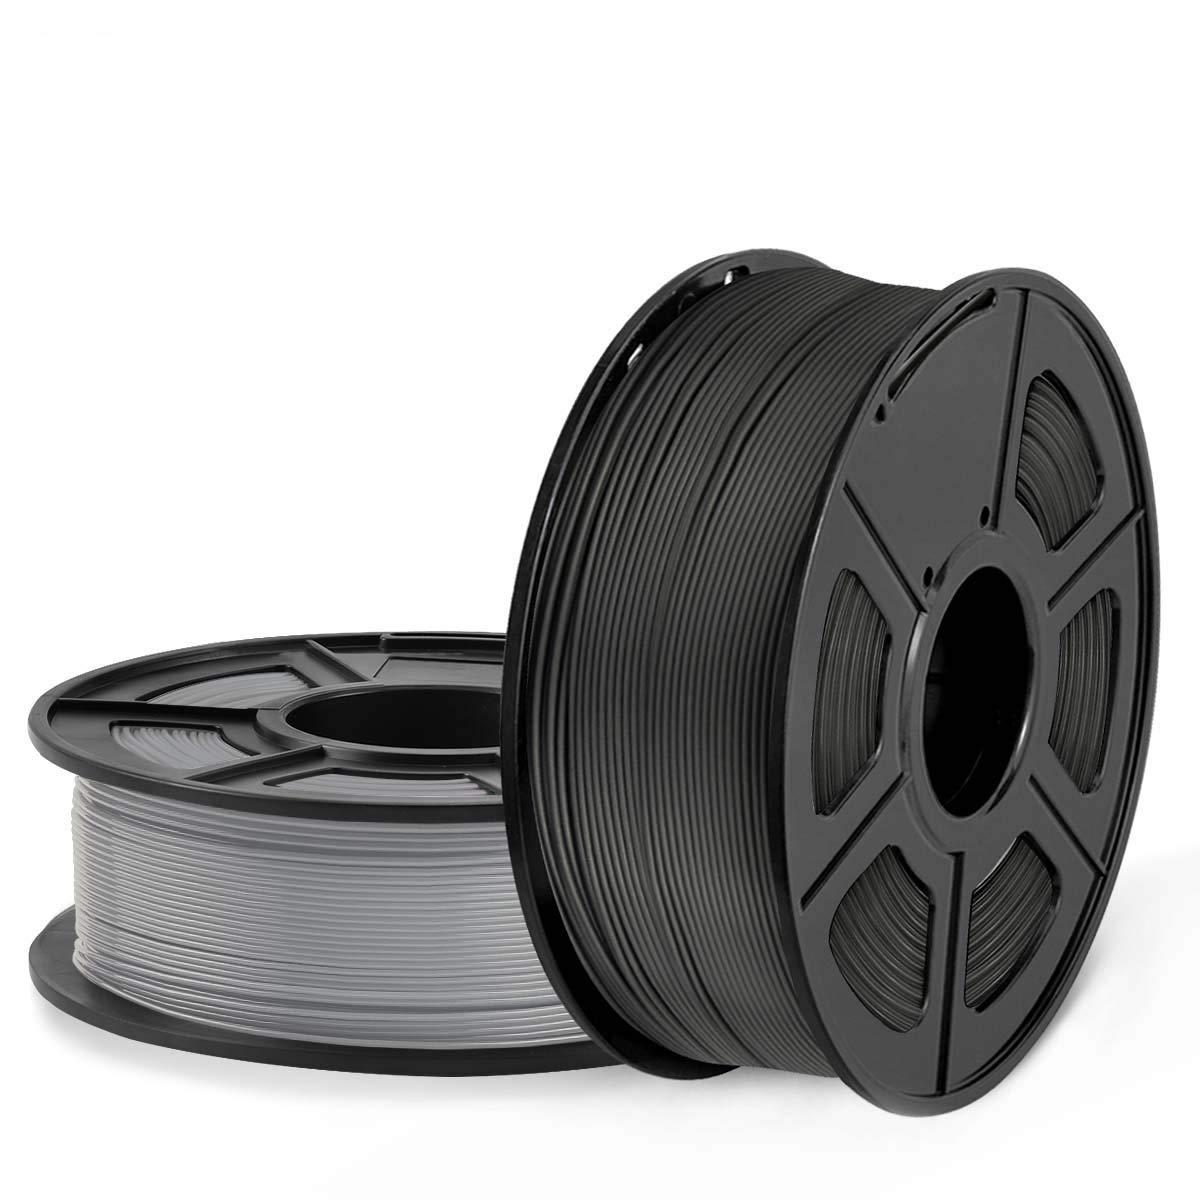 SUNLU Filamento PLA 1.75mm 2kg Impresora 3D Filamento, Precisión Dimensional +/- 0.02 mm, PLA Negro + Gris